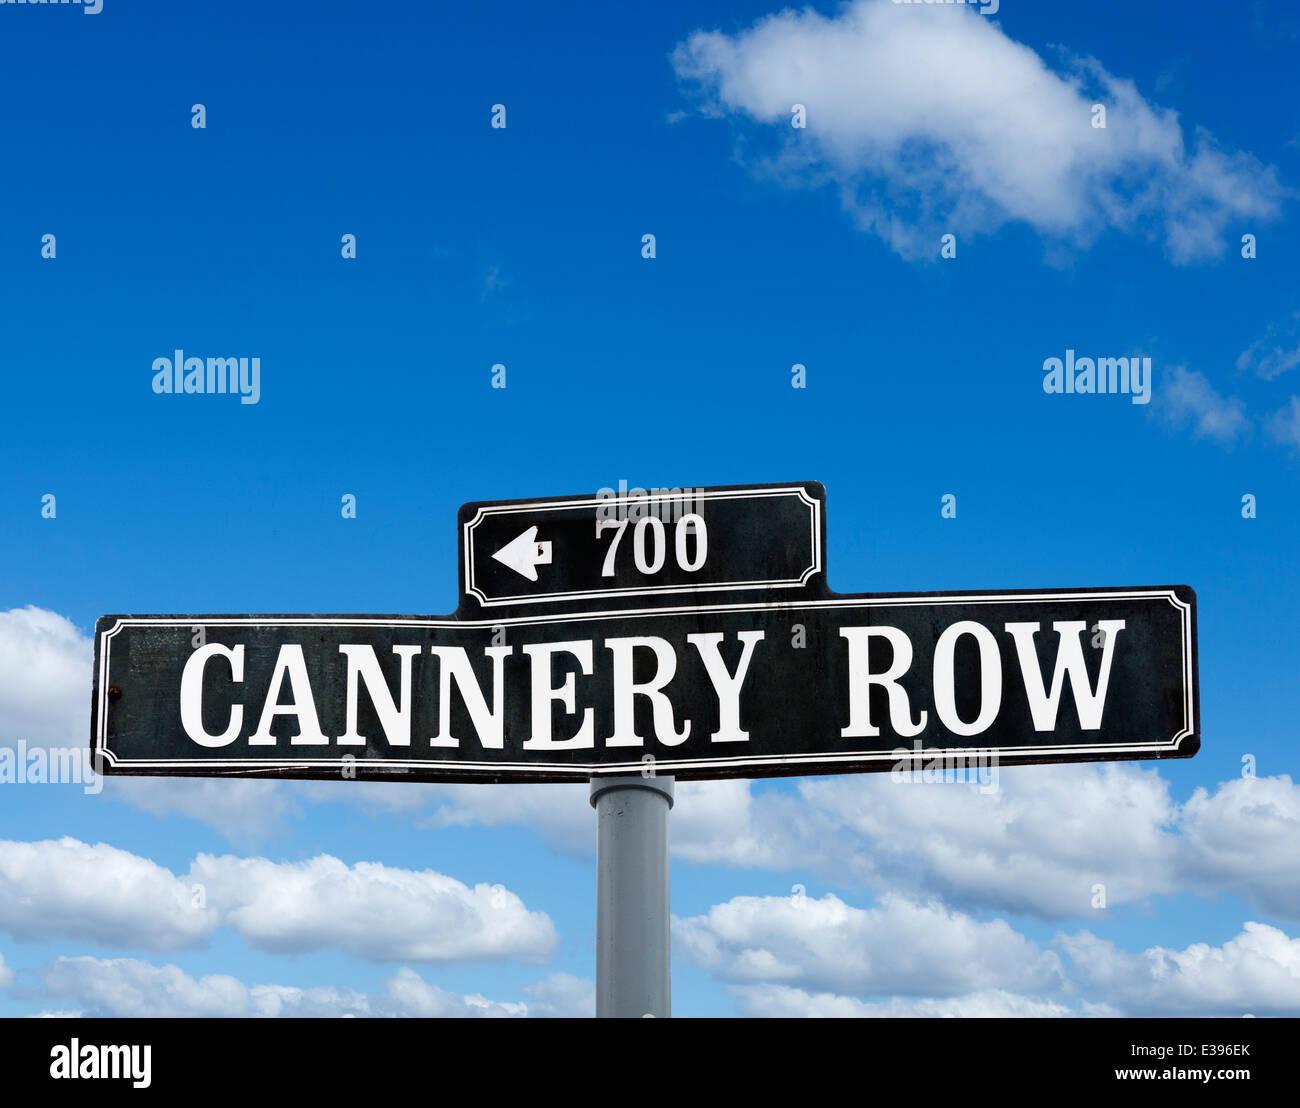 Cannery Row street sign, Monterey, California, USA - Stock Image